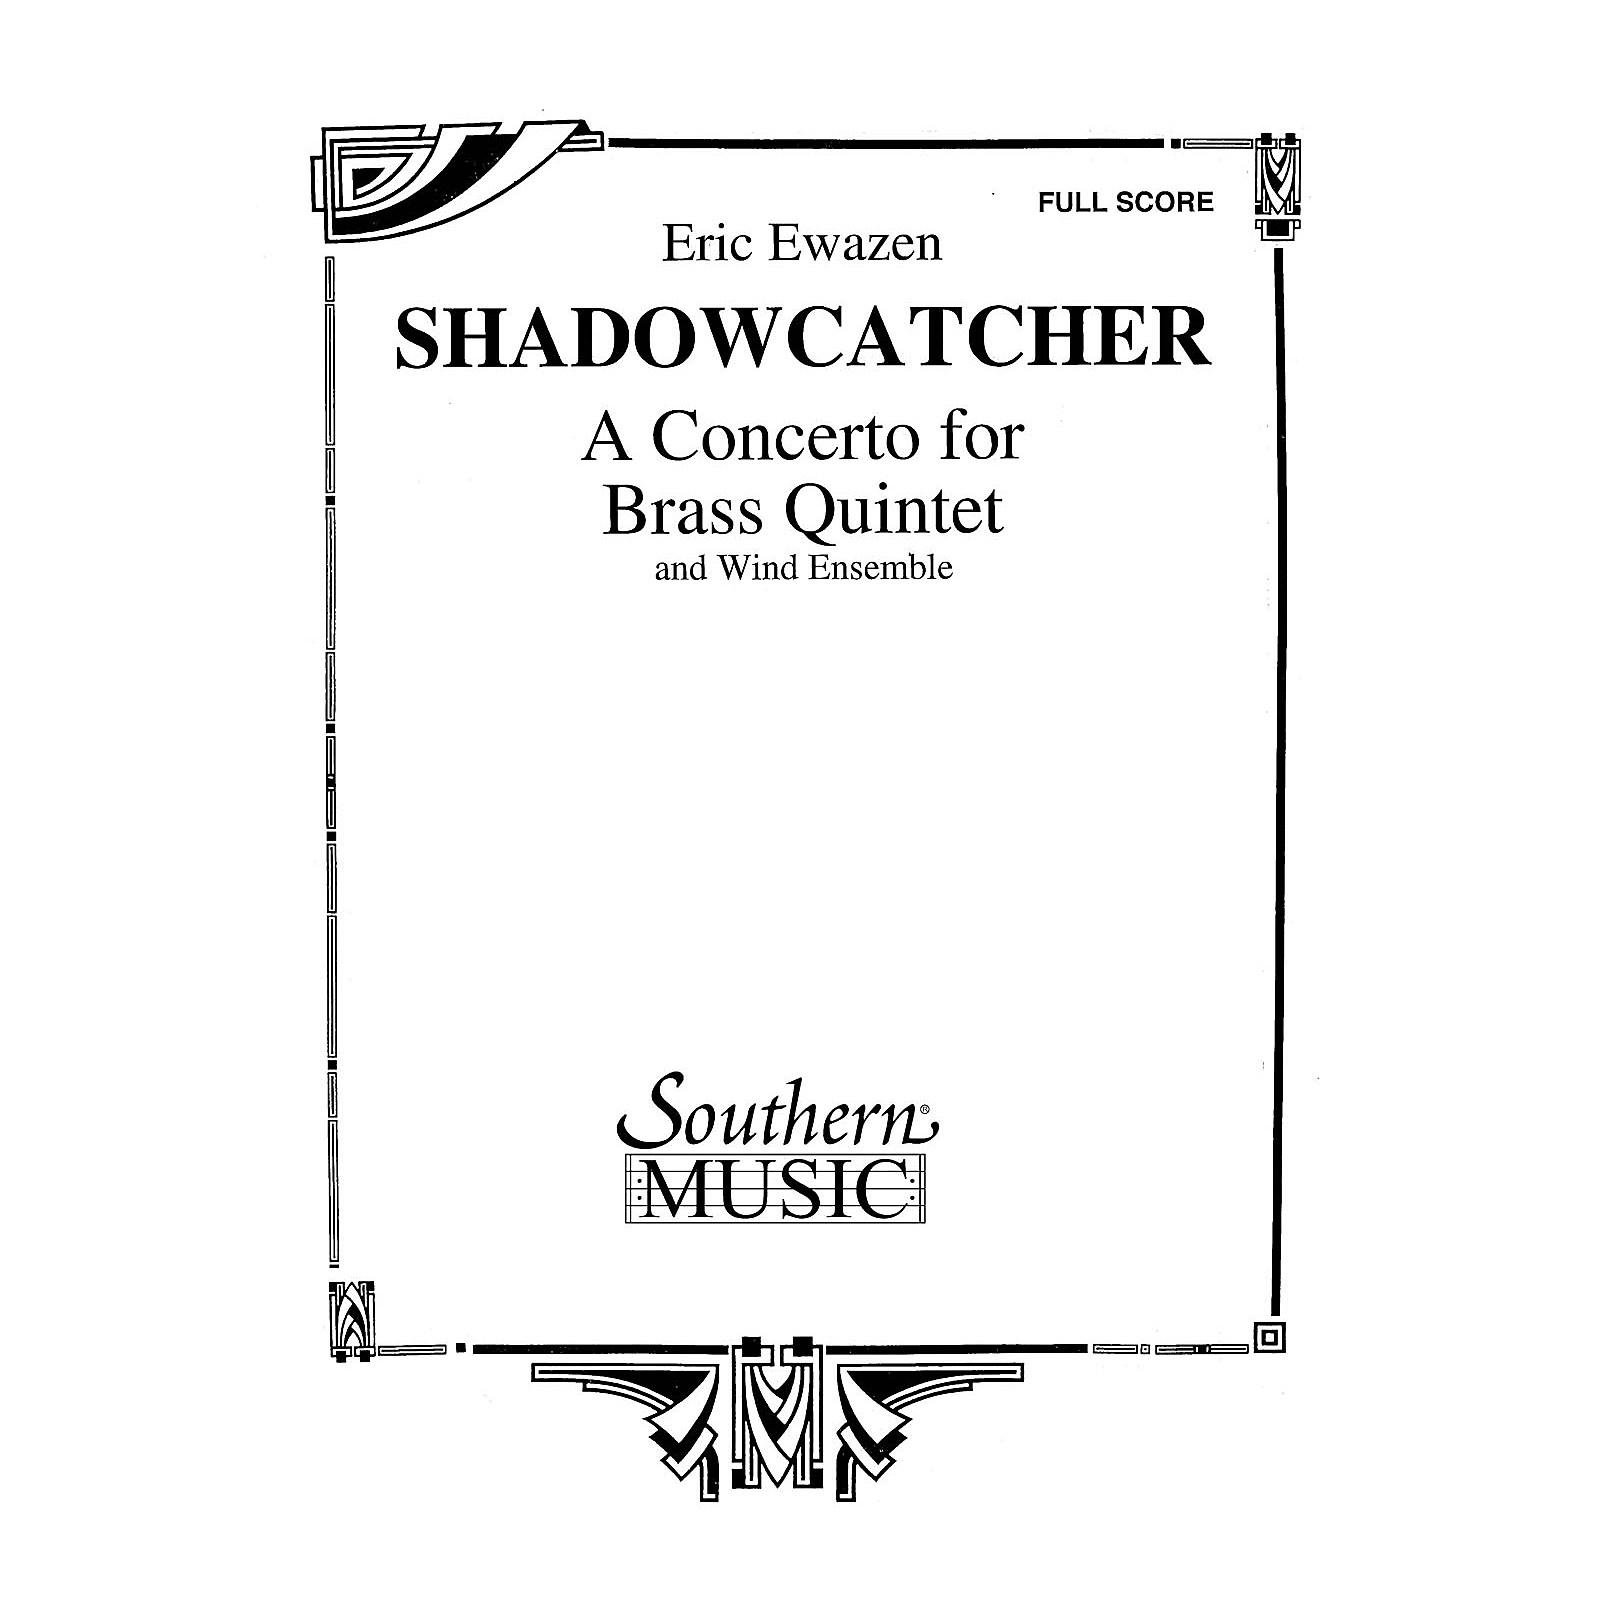 Southern Shadowcatcher (Brass Quintet and Wind Ensemble